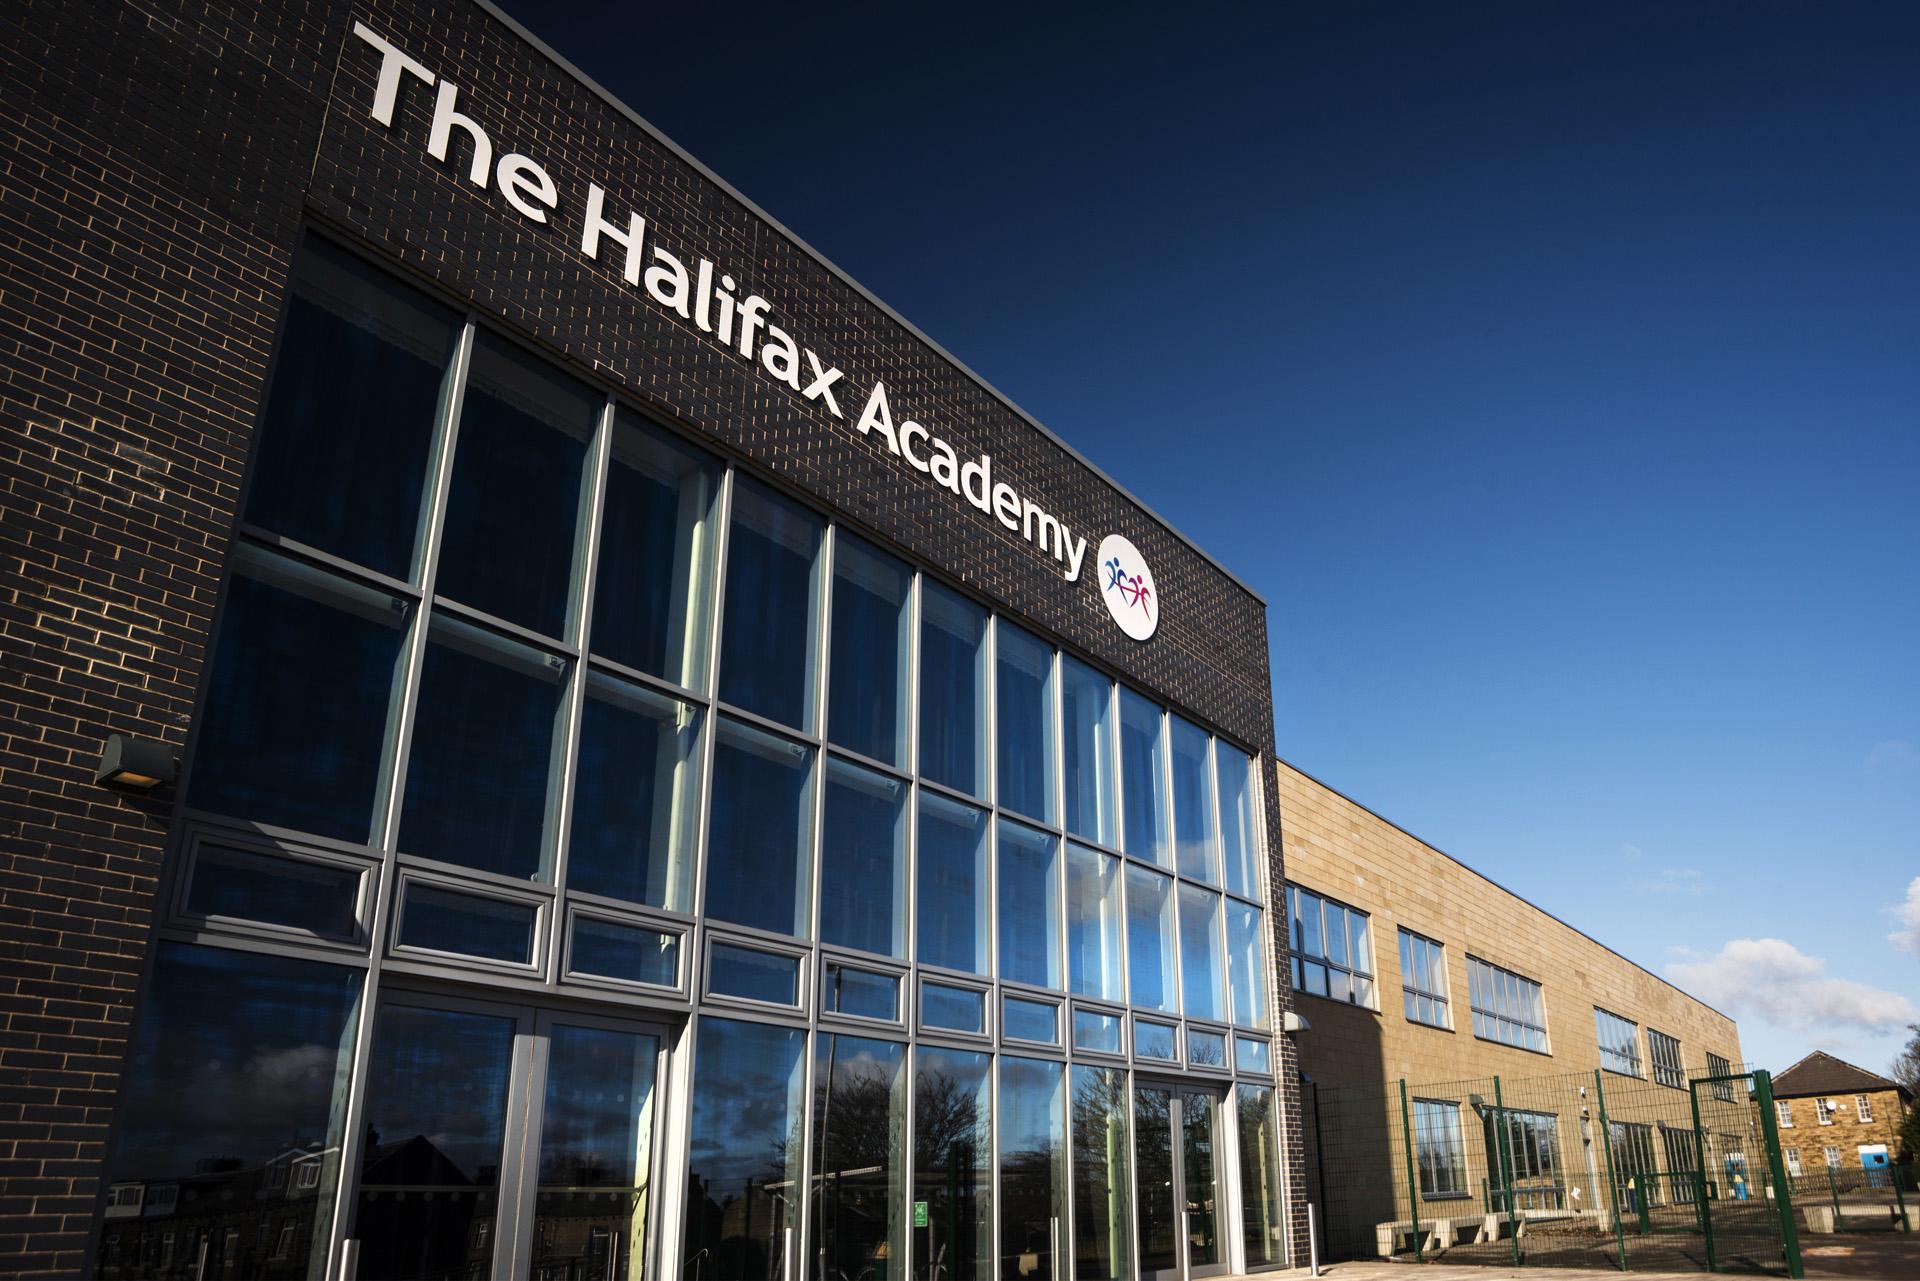 Halifax Primary Academy - YORbuild Framework/halifax-primary-academy-yorbuild-framework